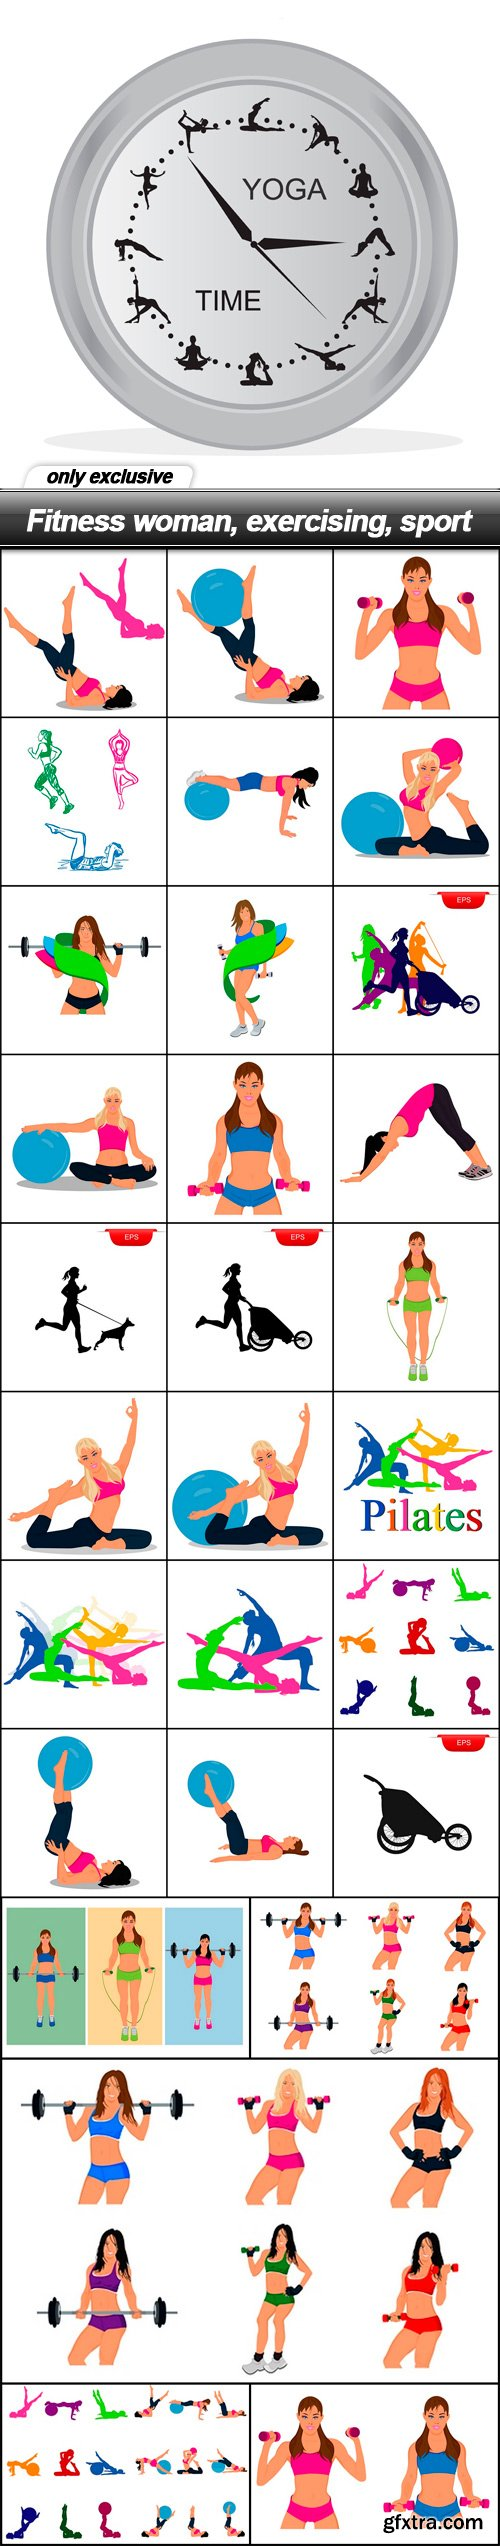 Fitness woman, exercising, sport - 30 EPS